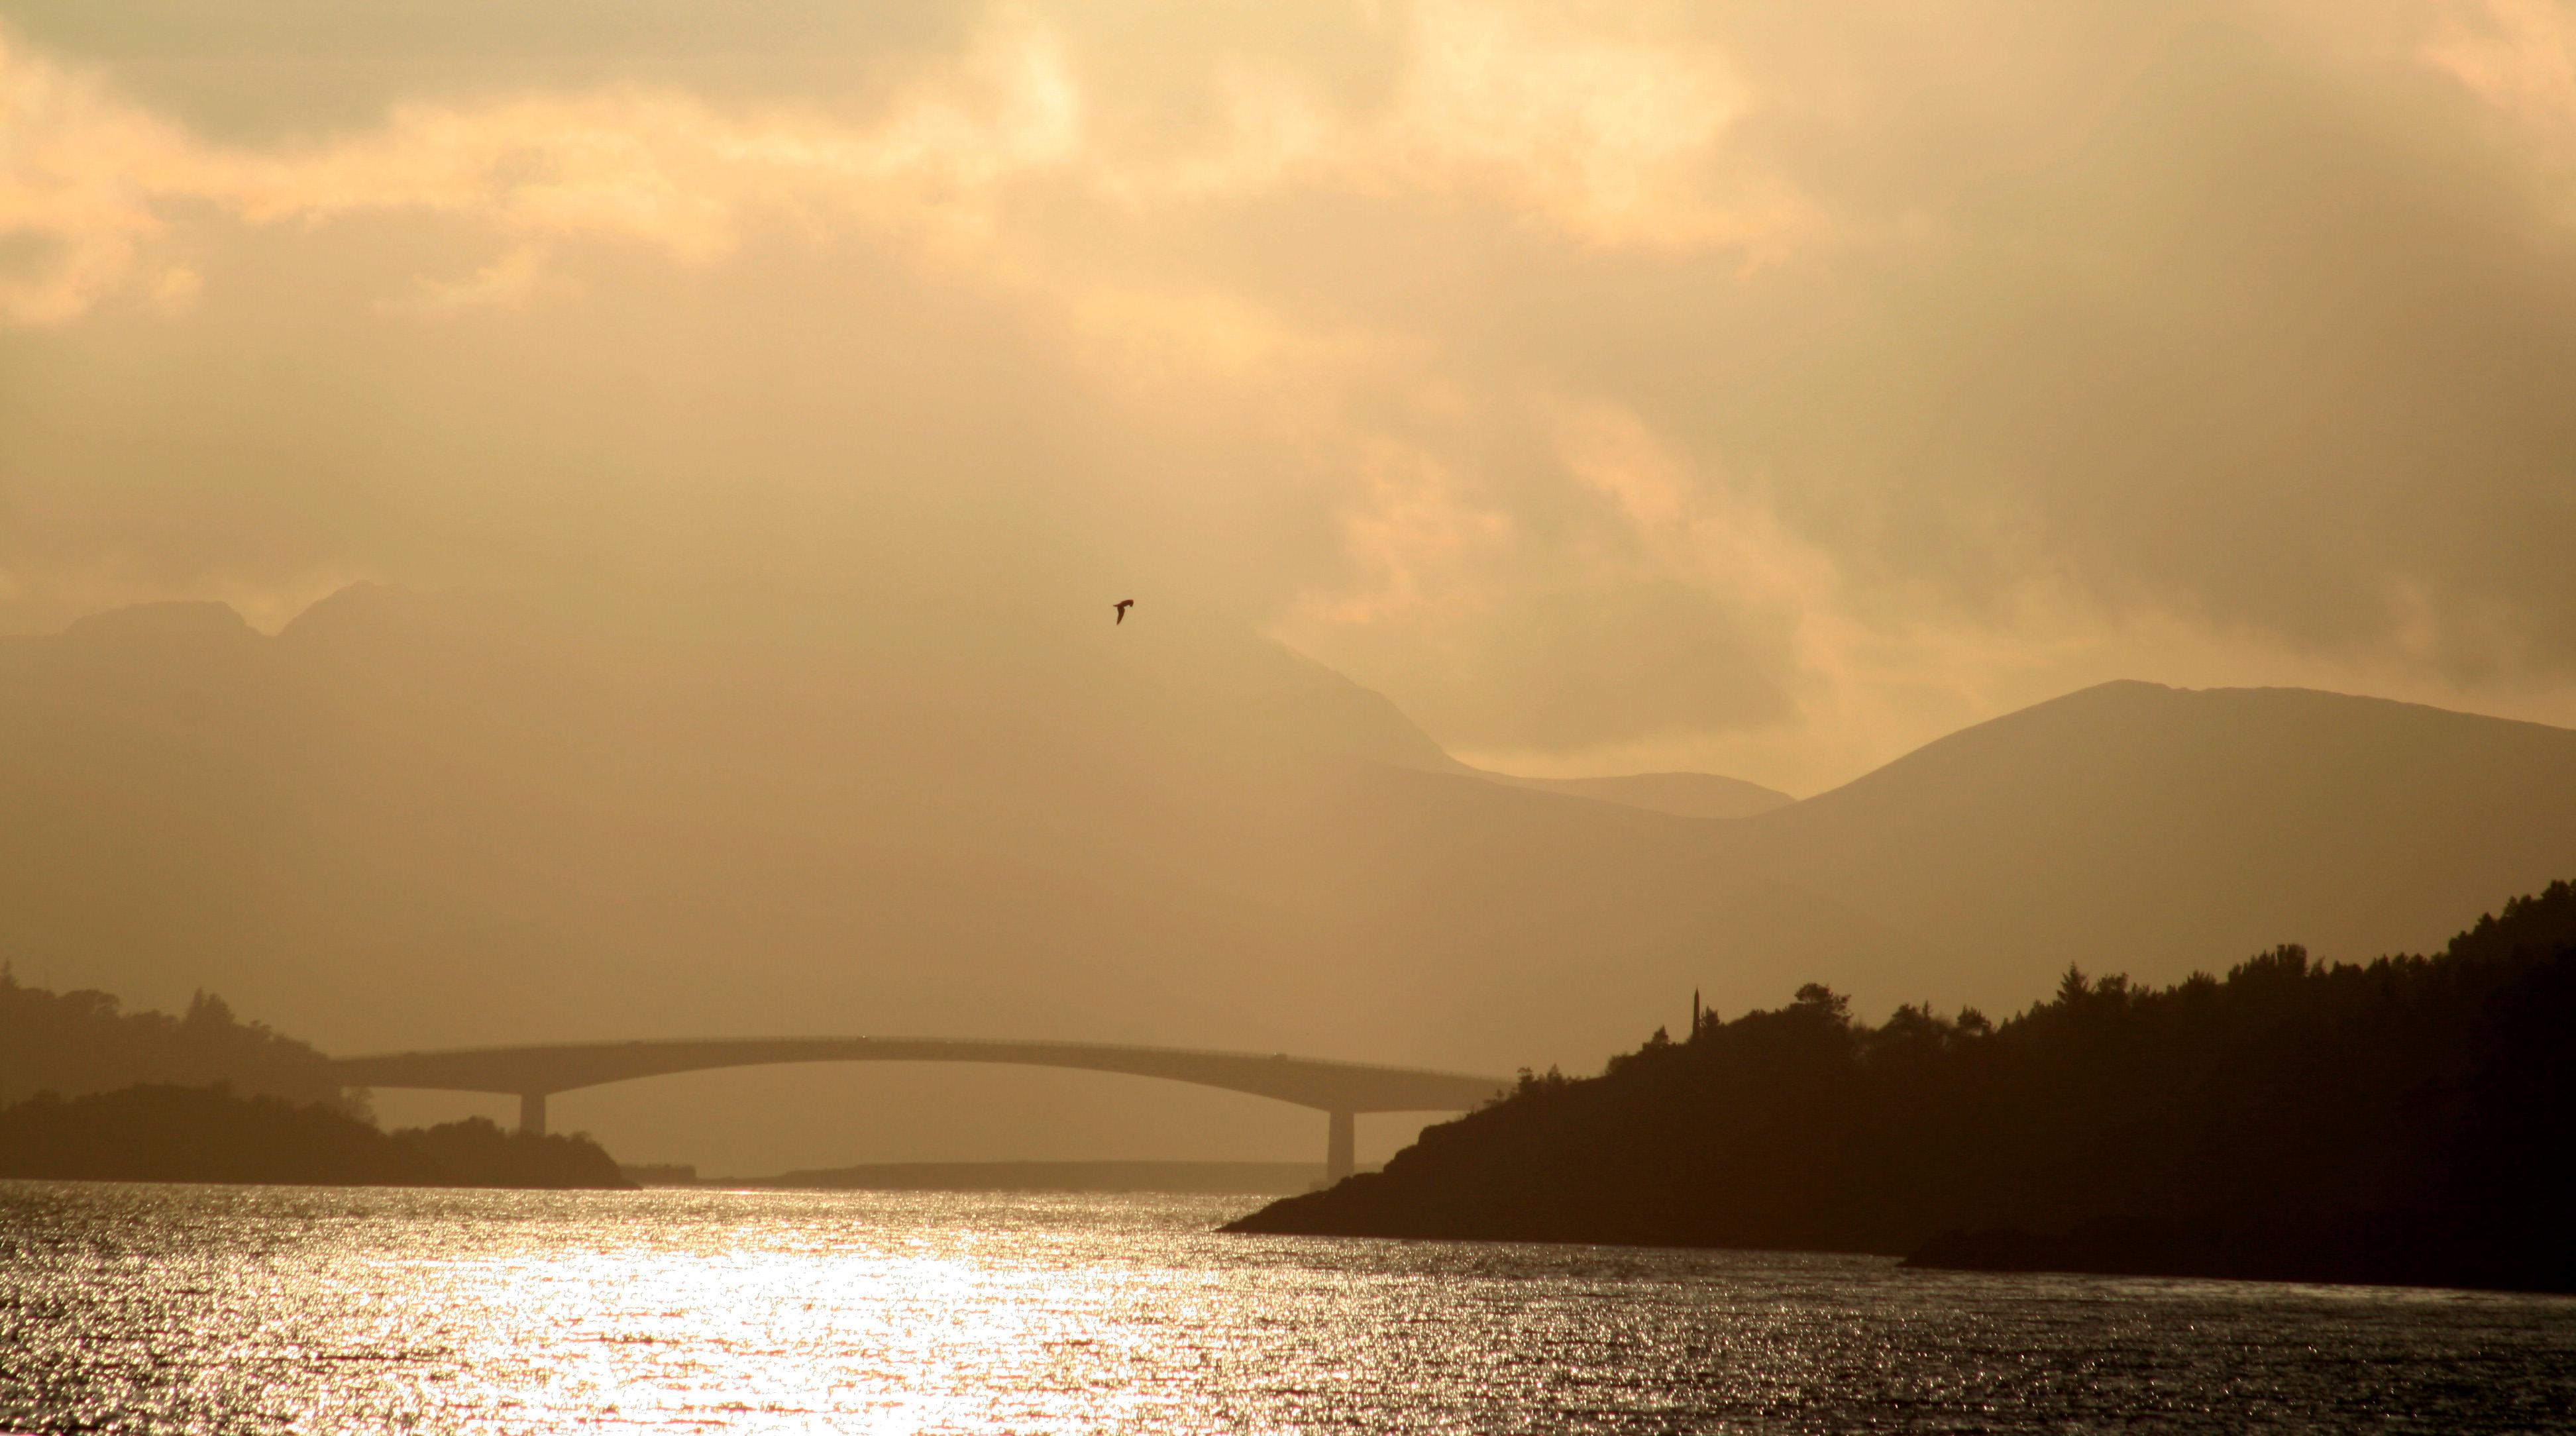 18_9088 Skye_Bridge_Scotland Copyright Shelagh Donnelly